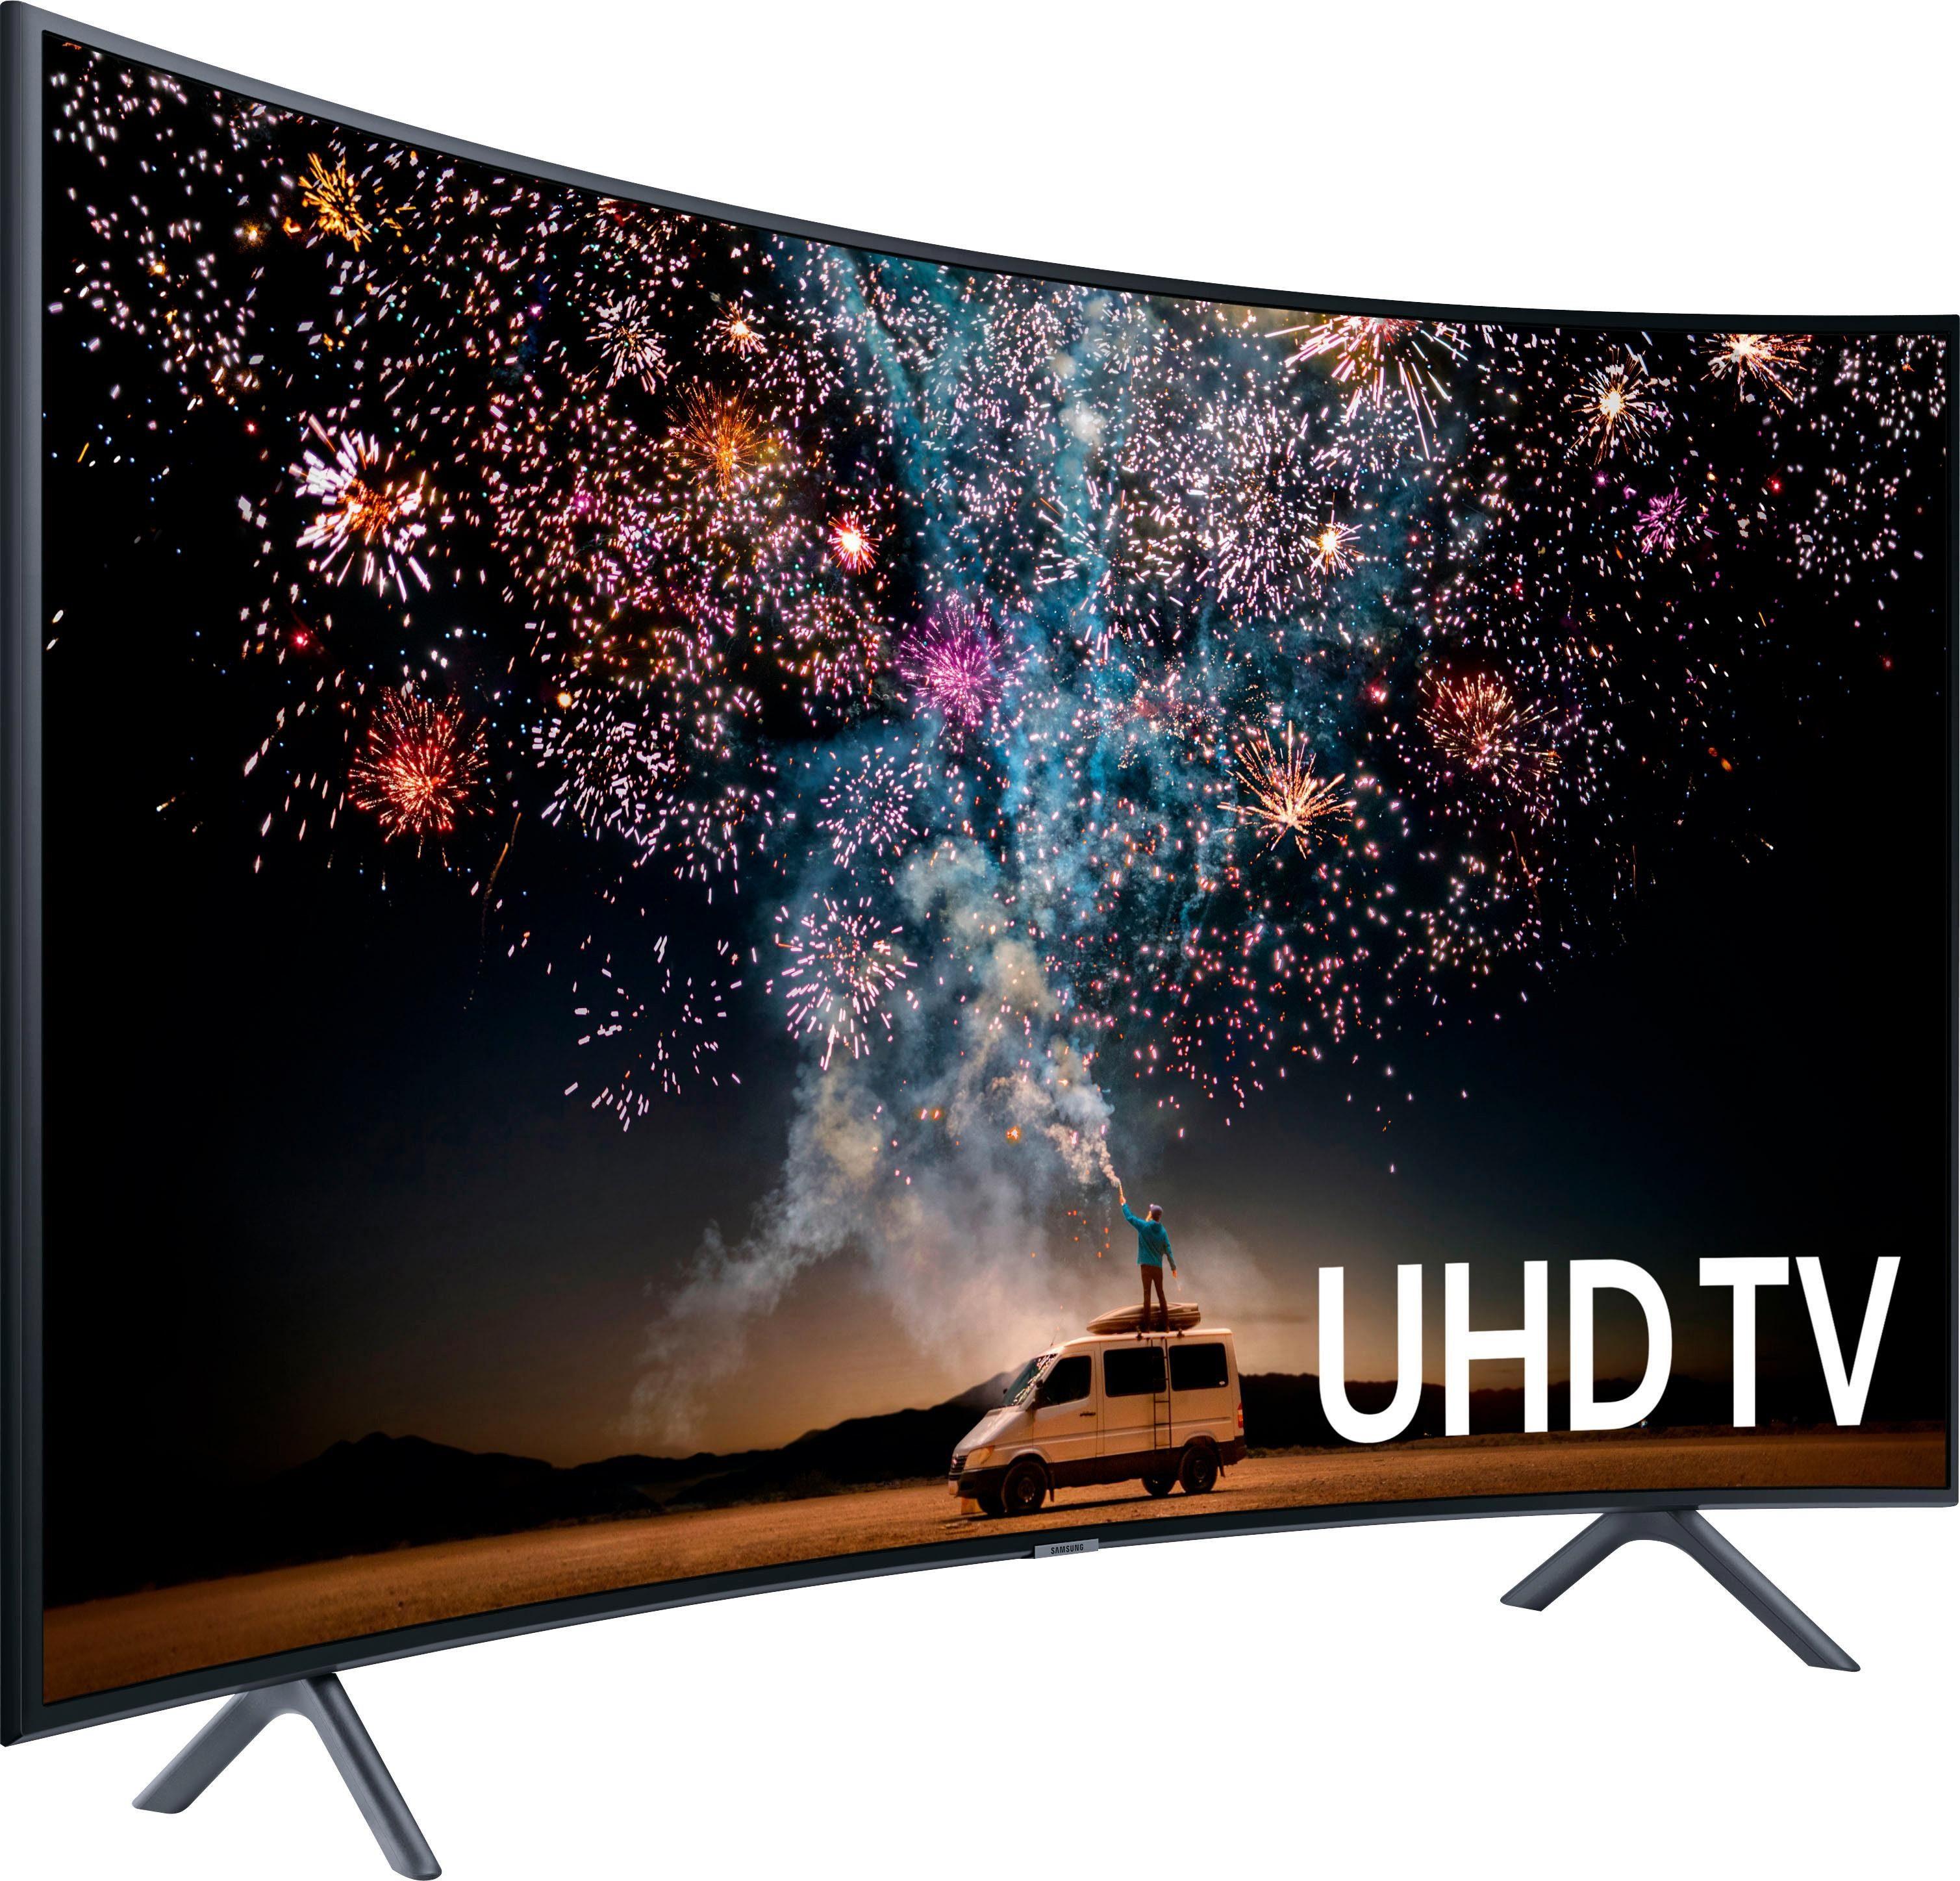 samsung ue65ru7379 curved led fernseher 163 cm 65 zoll 4k ultra hd smart tv airplay online kaufen otto